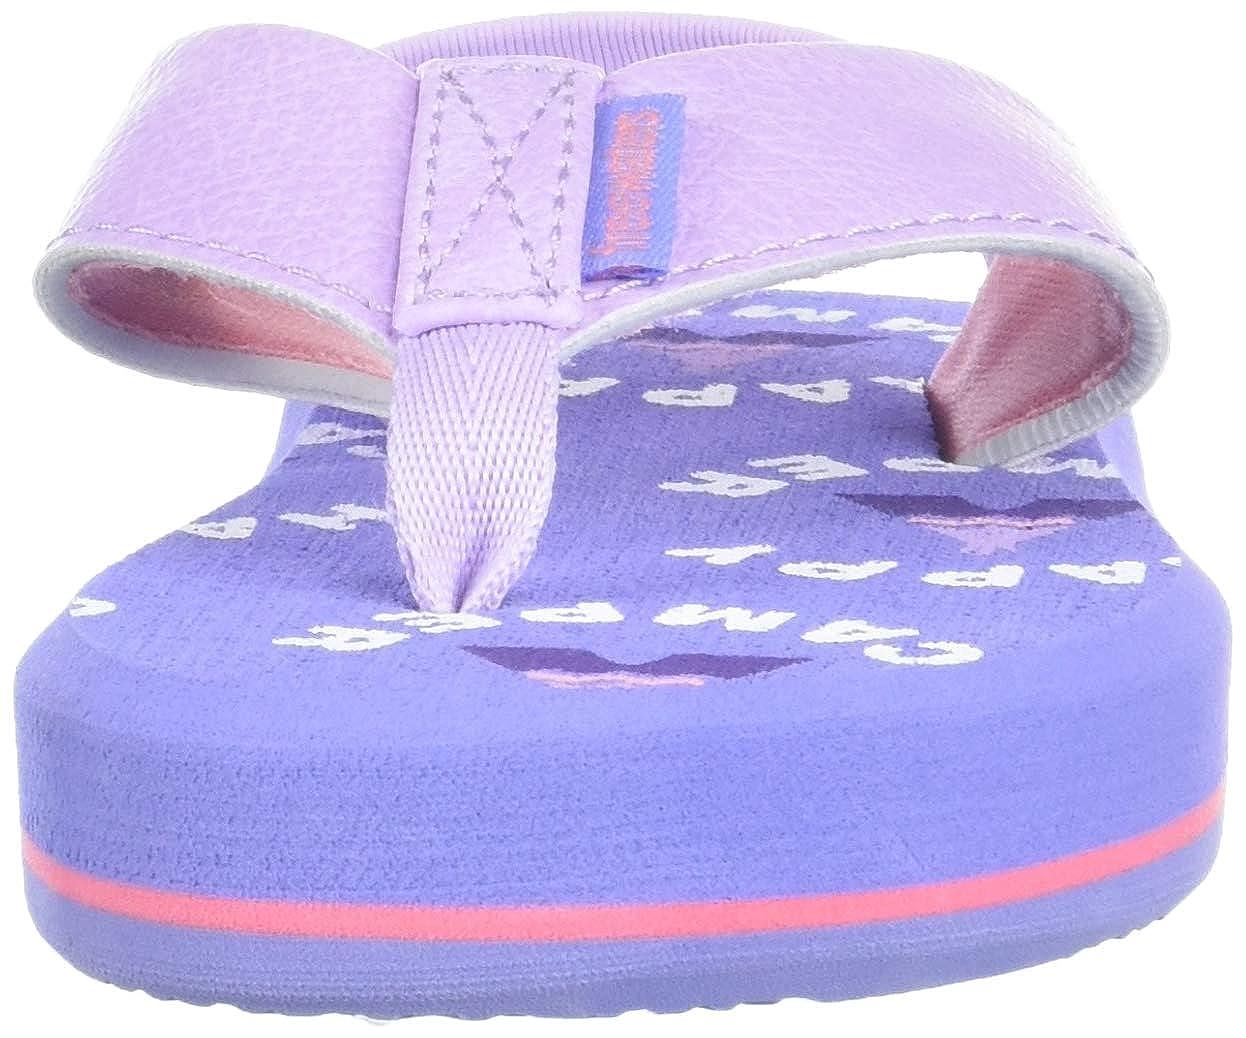 Freewaters Kids Mini Flip Sandal with Supreem Foam Footbed Flop